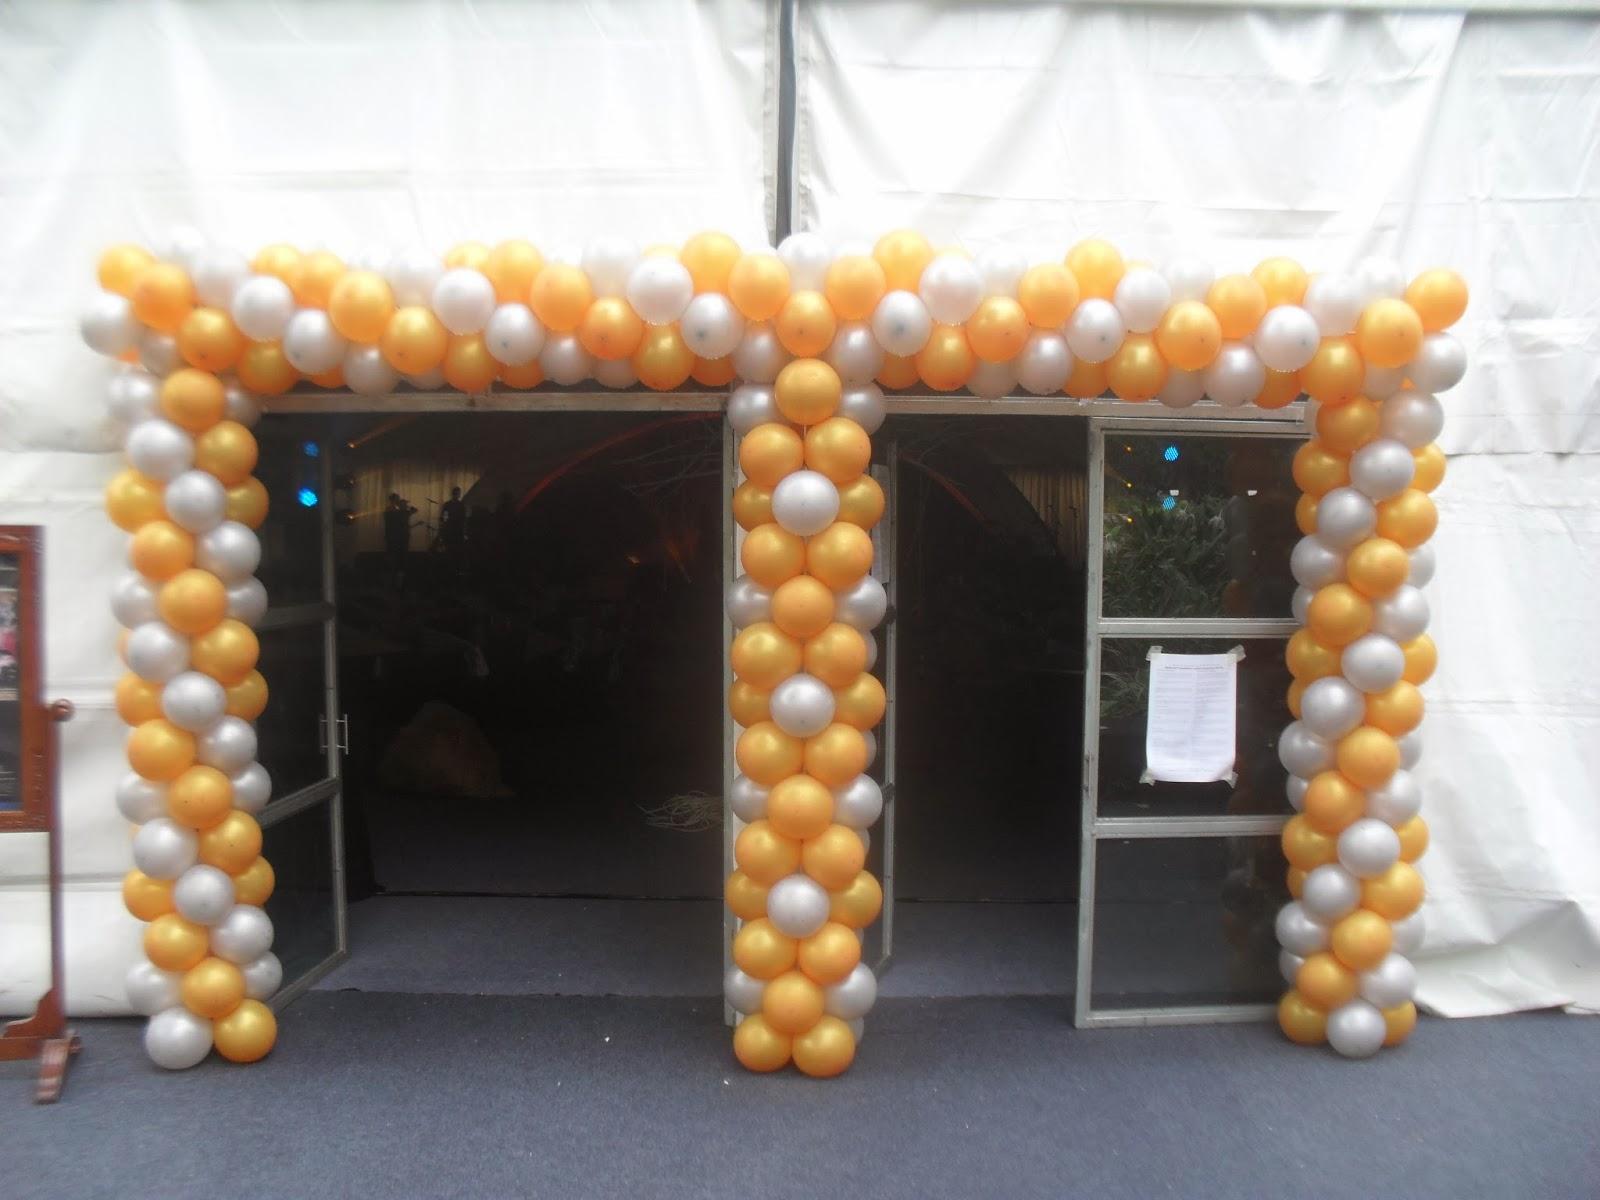 balon dekorasi balon dekorasi balon dekorasi balon dekorasi balon